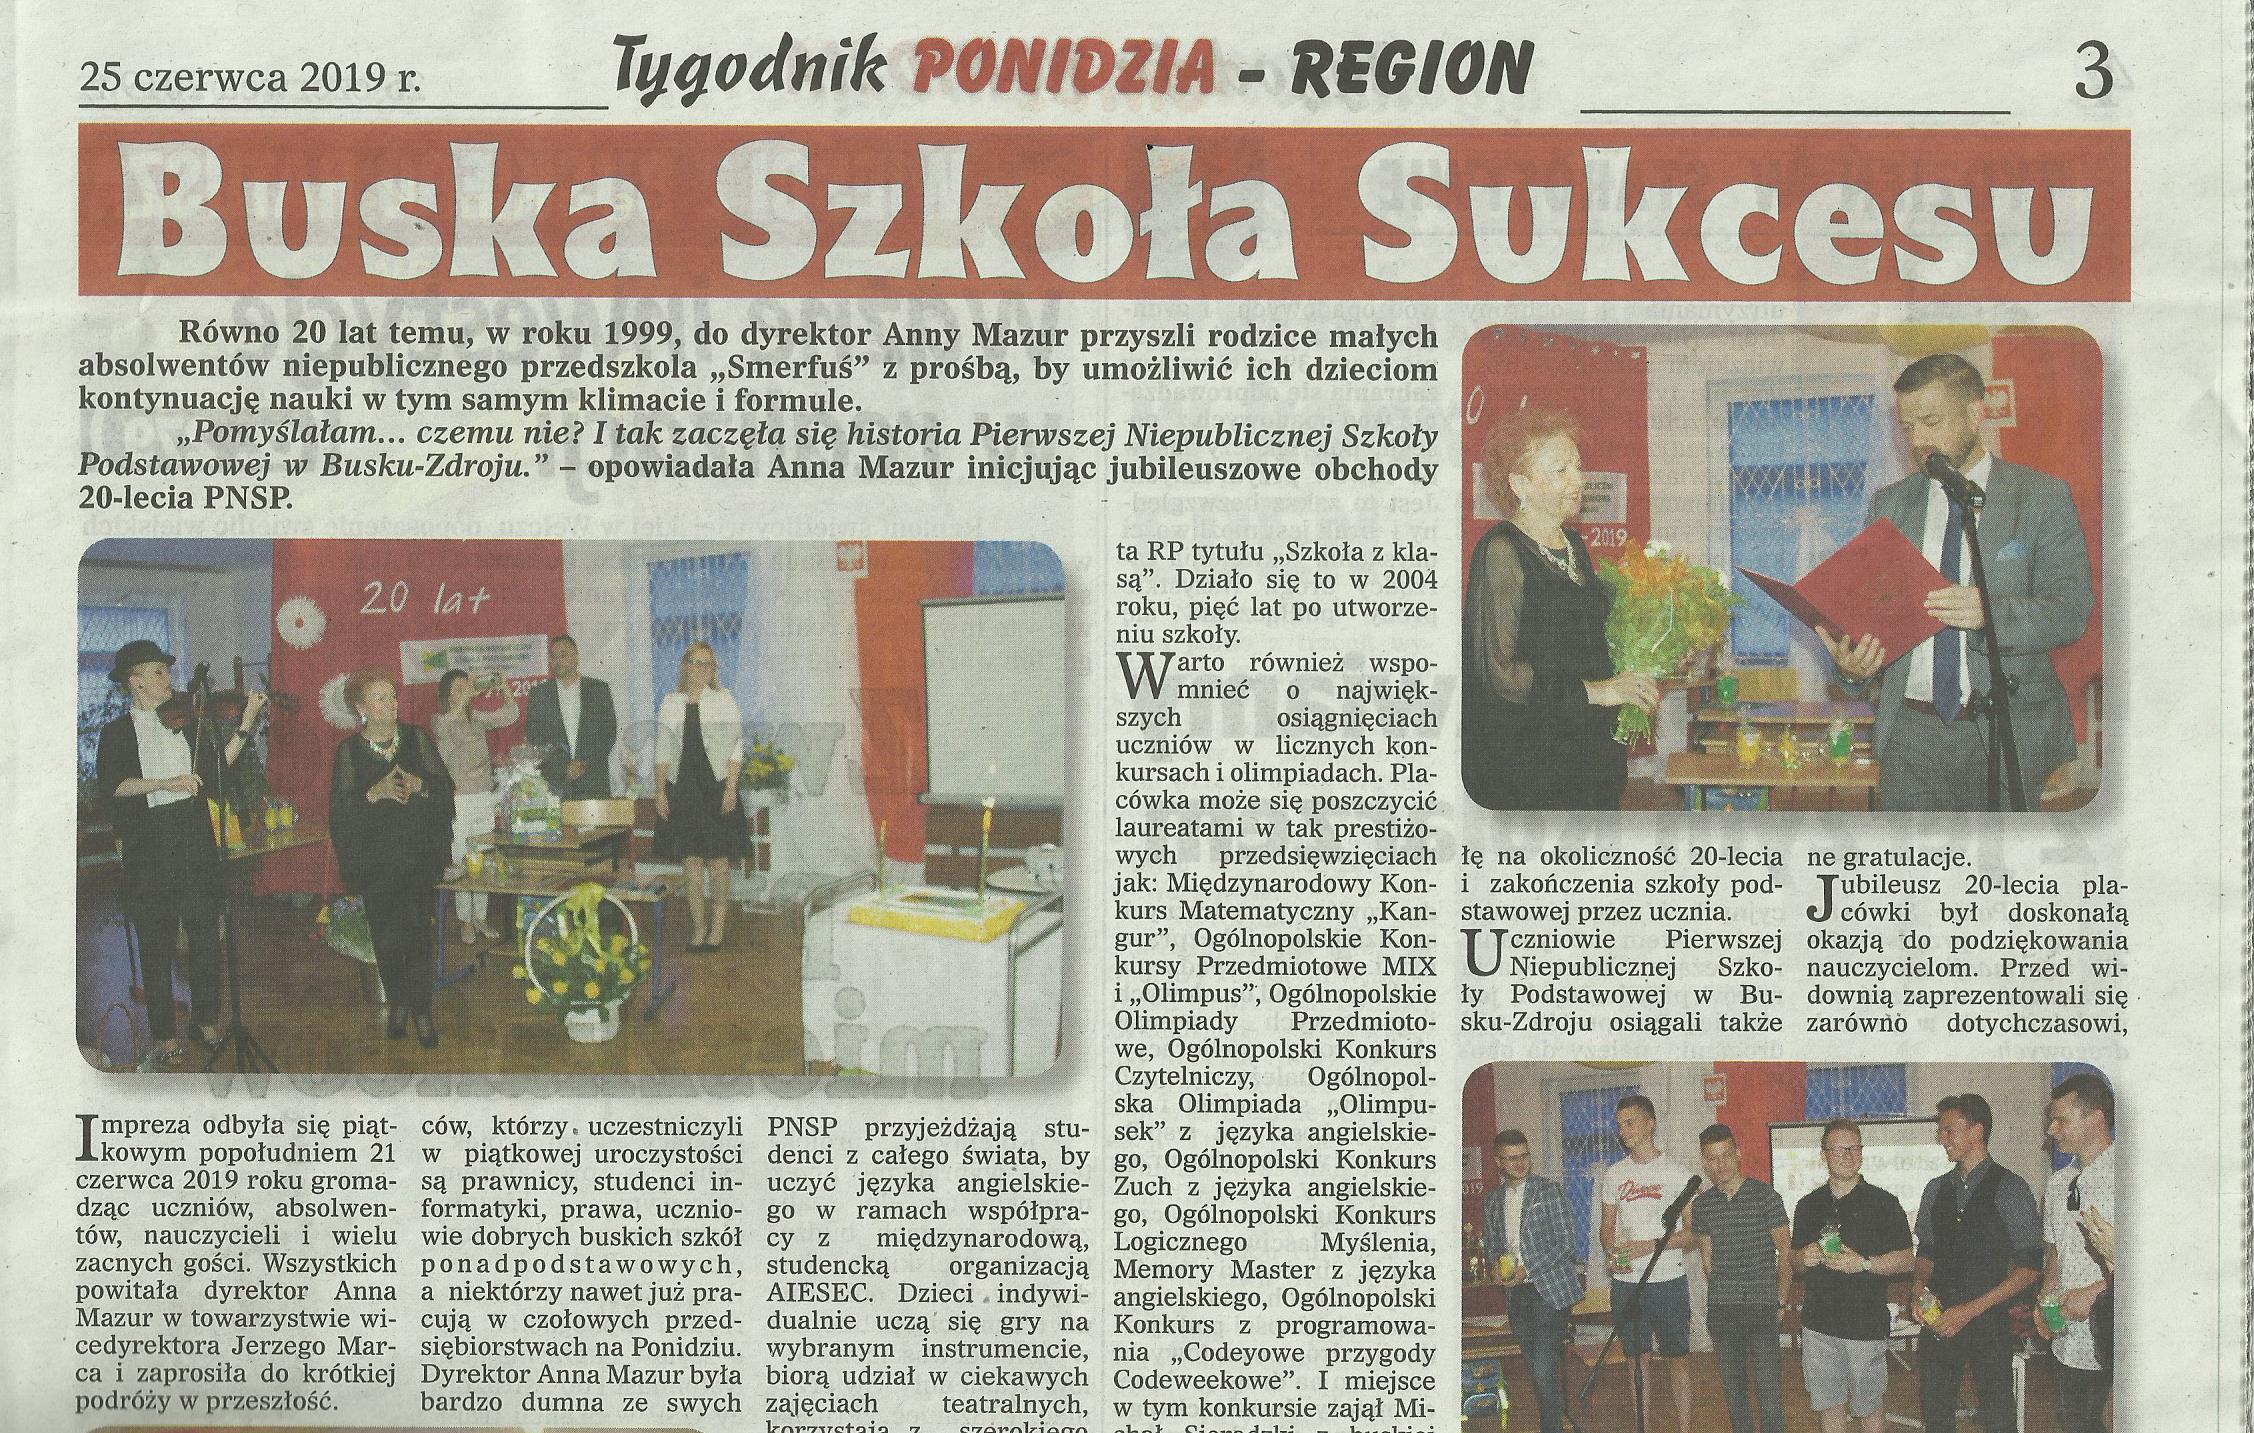 BUSKA_SZKOLA_SUKCESU0002.jpg